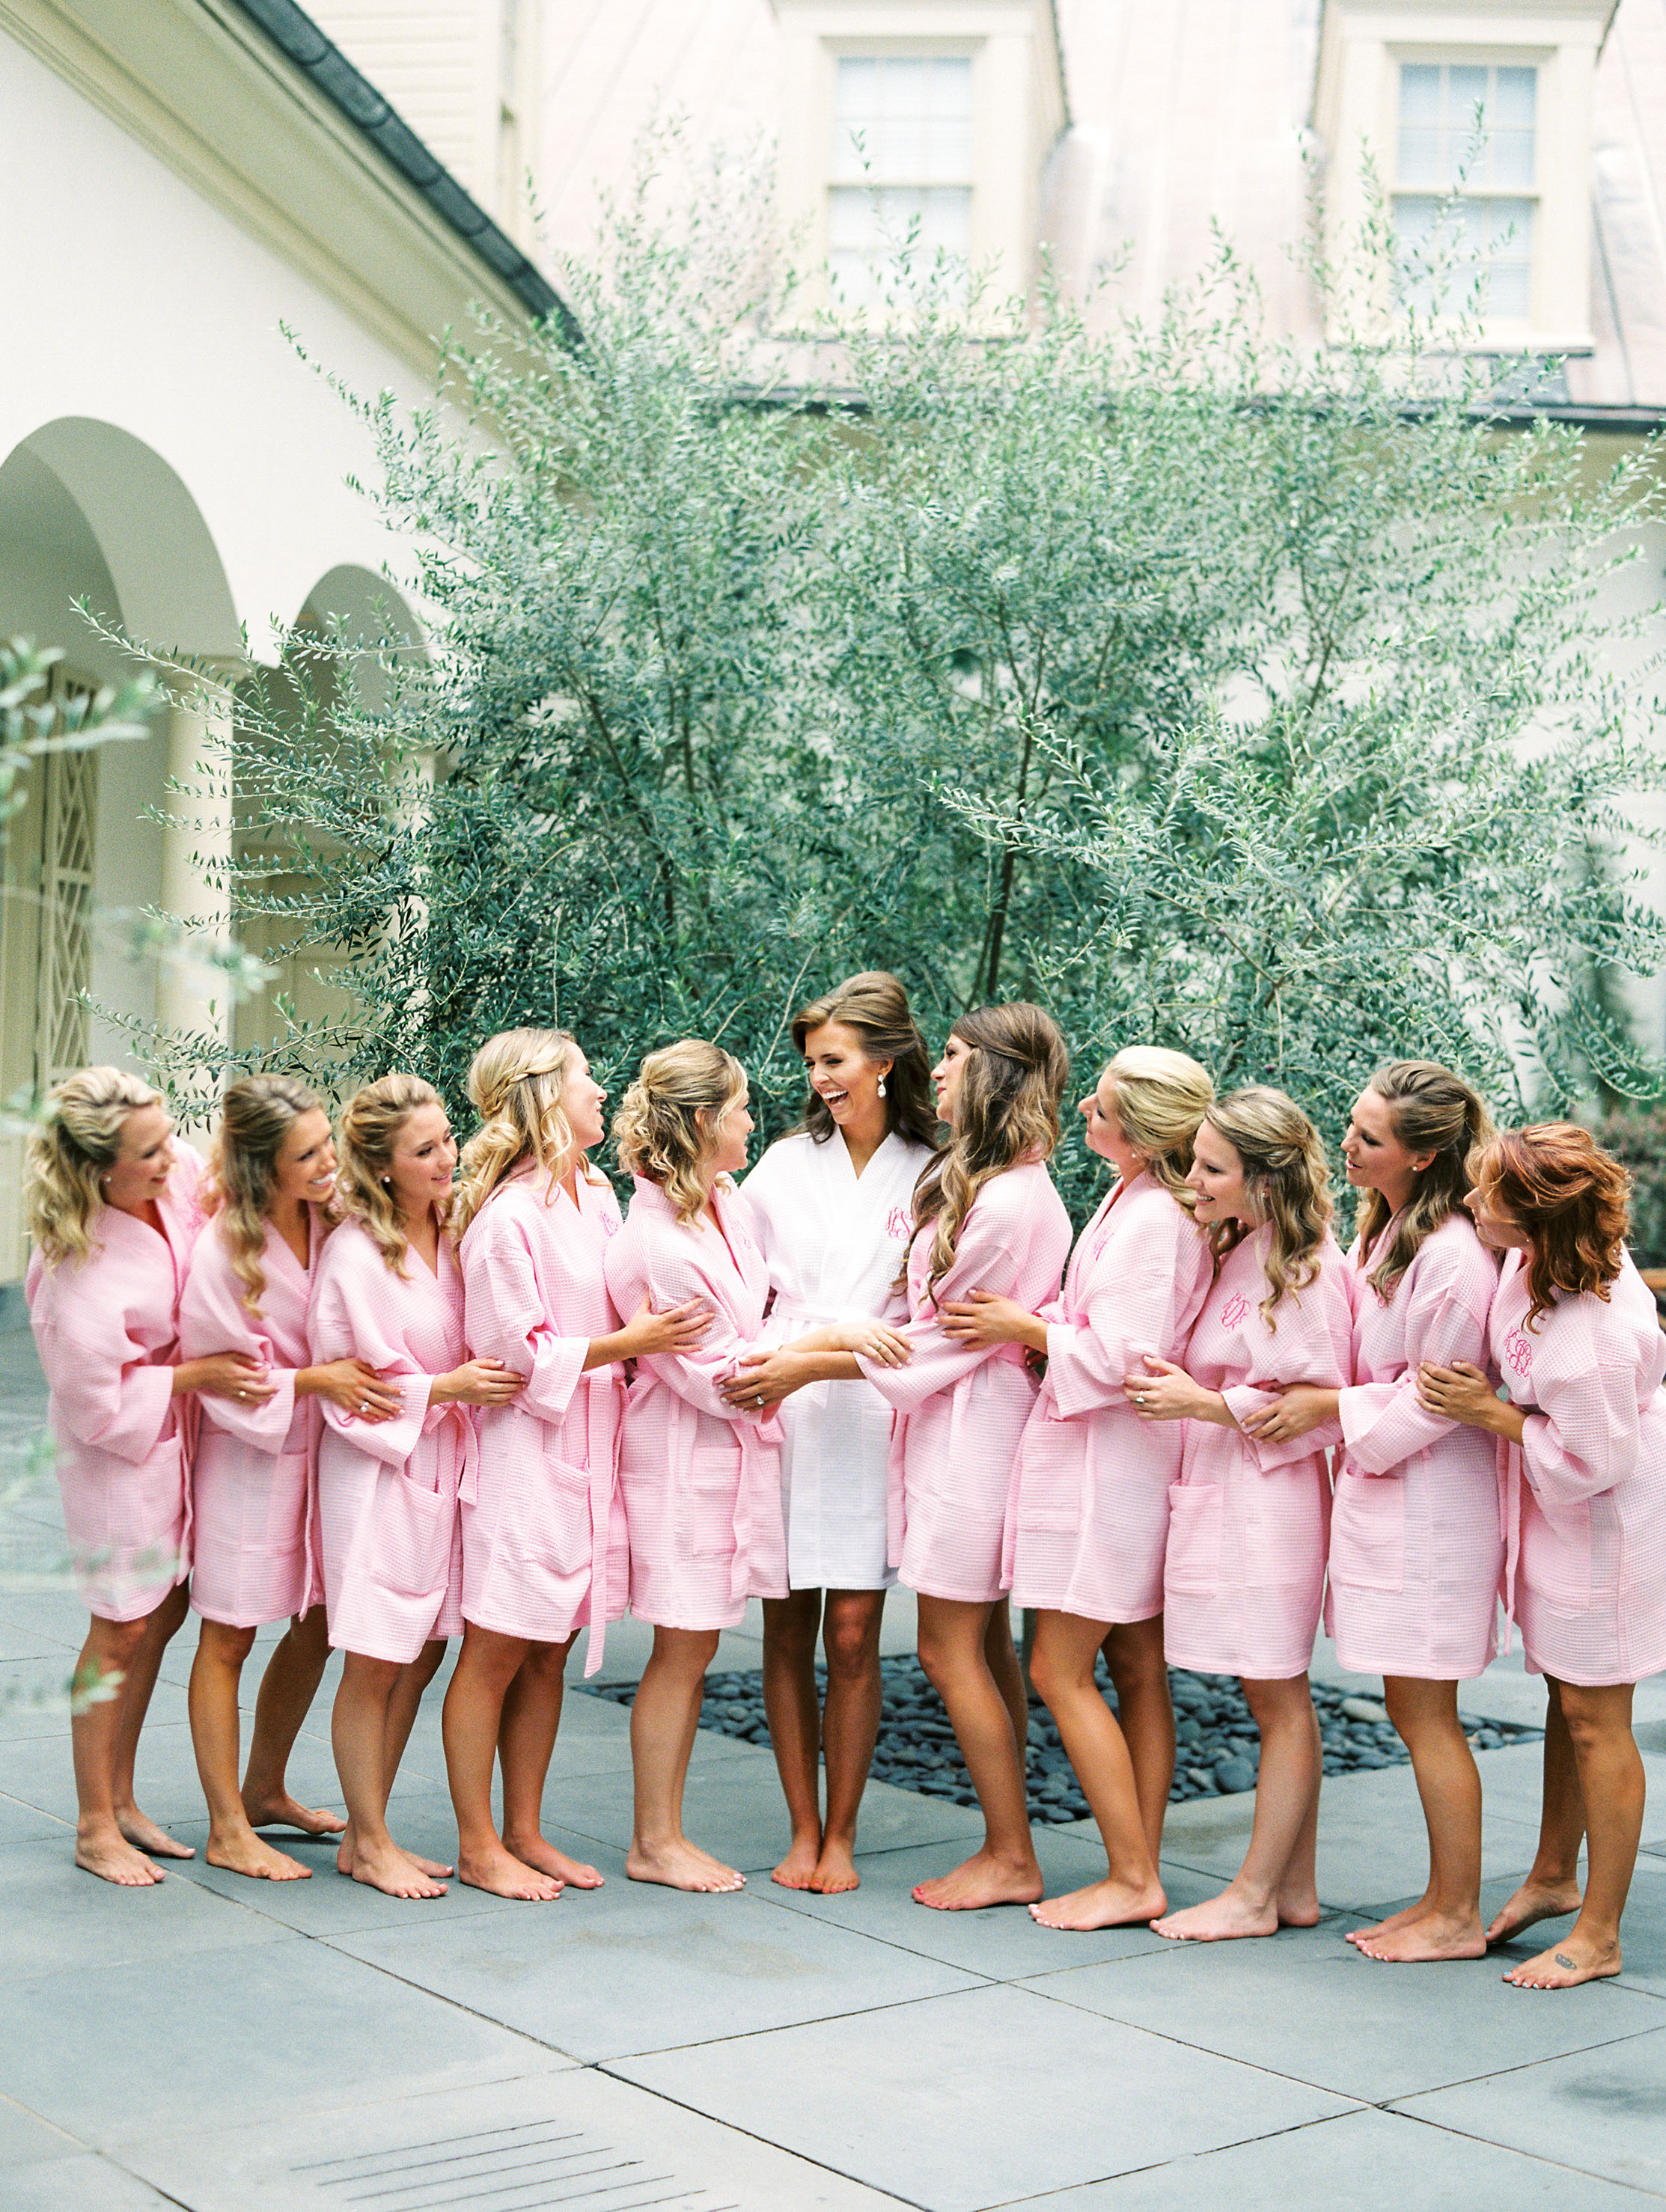 Dana-Fernandez-Photography-Weddings-in-Houston-Magazine-feature-Houston-wedding-photographer-film-6.jpg